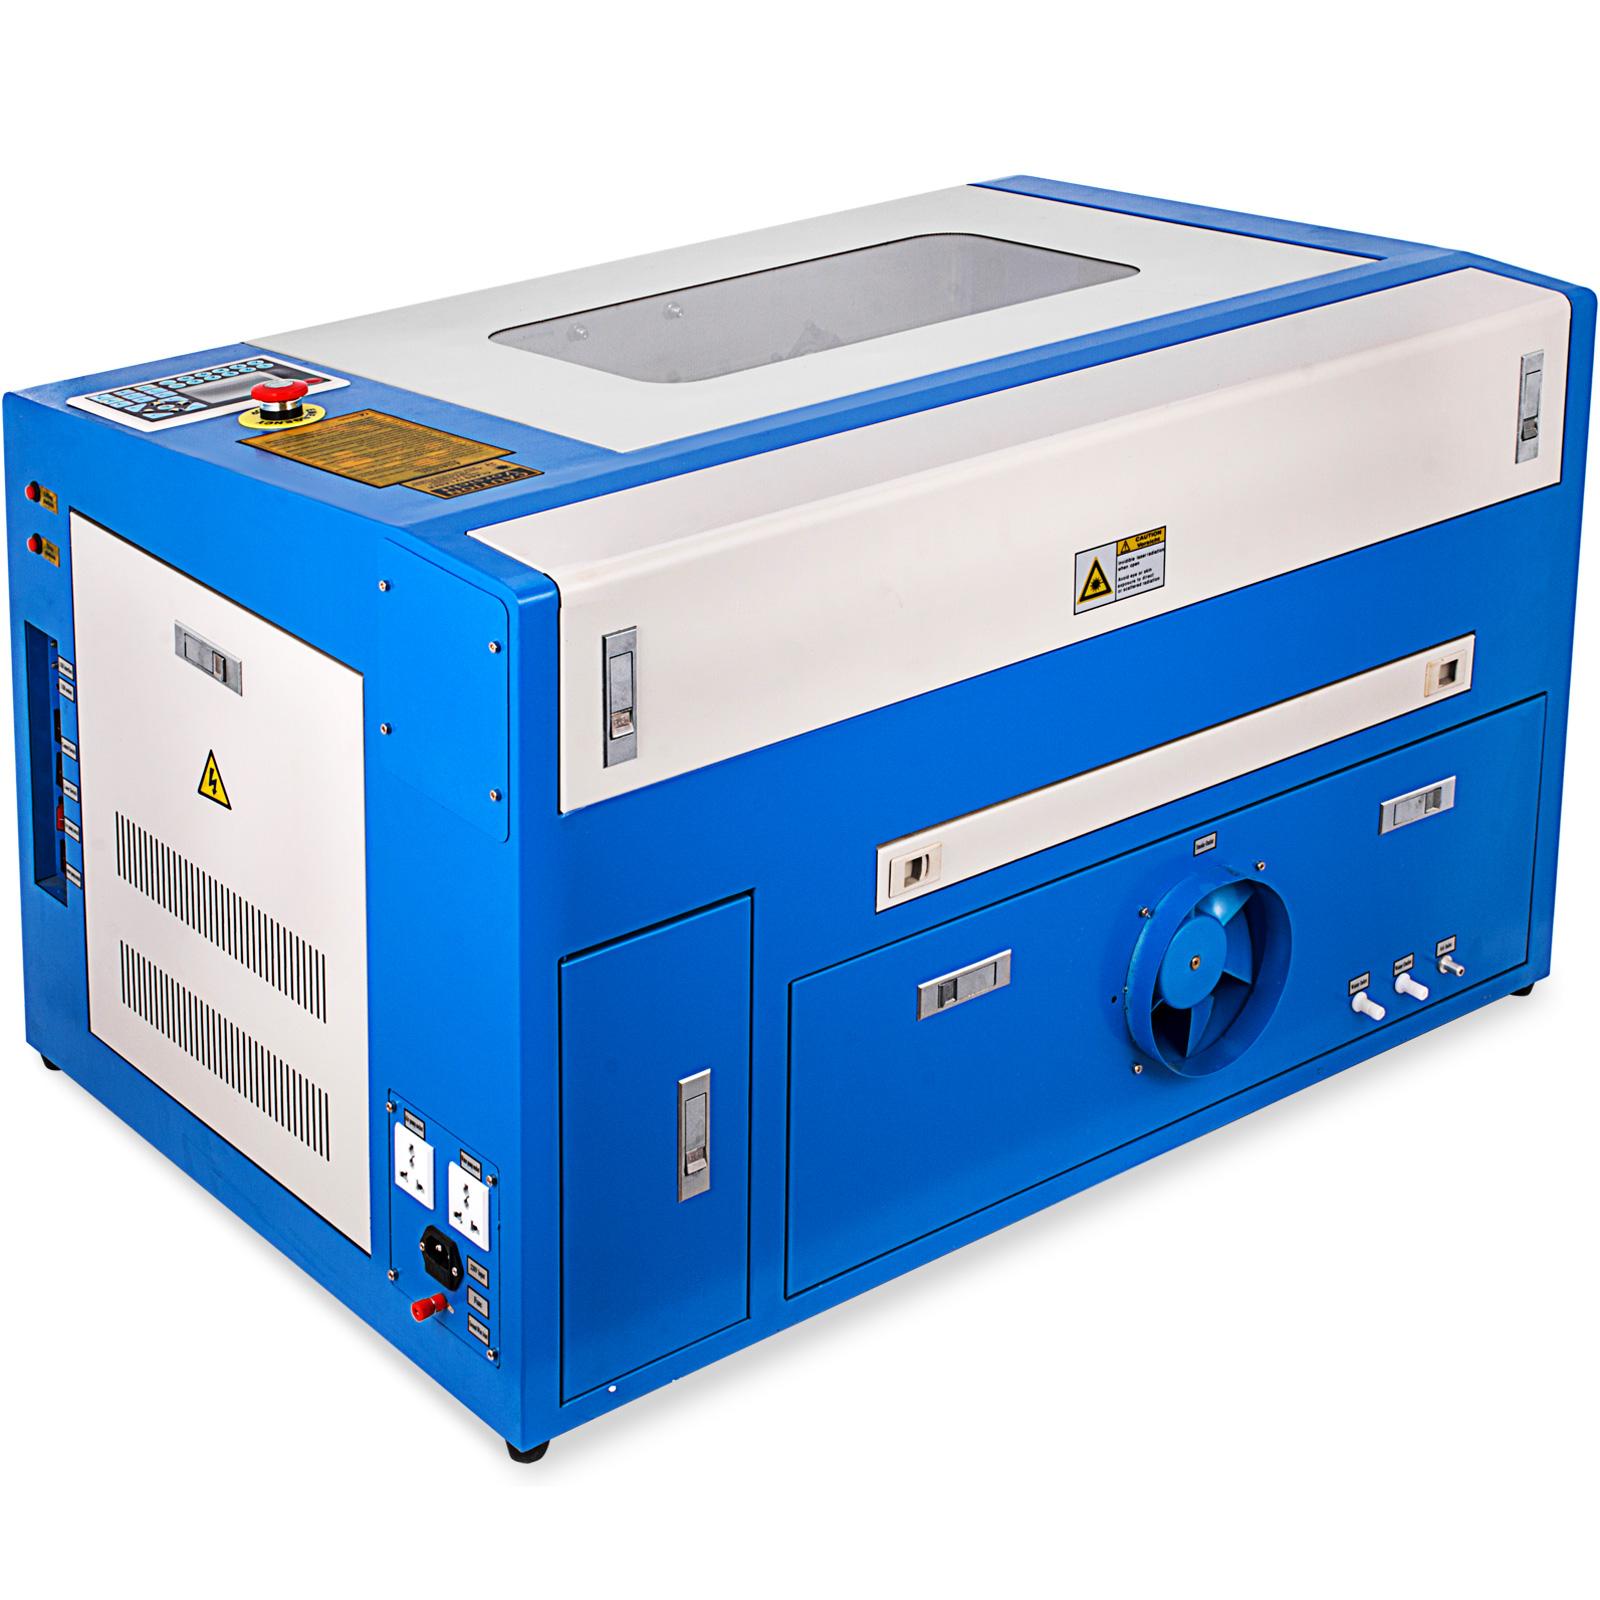 Macchina-per-Incisione-Laser-CO2-40-130W-Asse-Rotante-Tagliatrice-Incisore miniatura 28